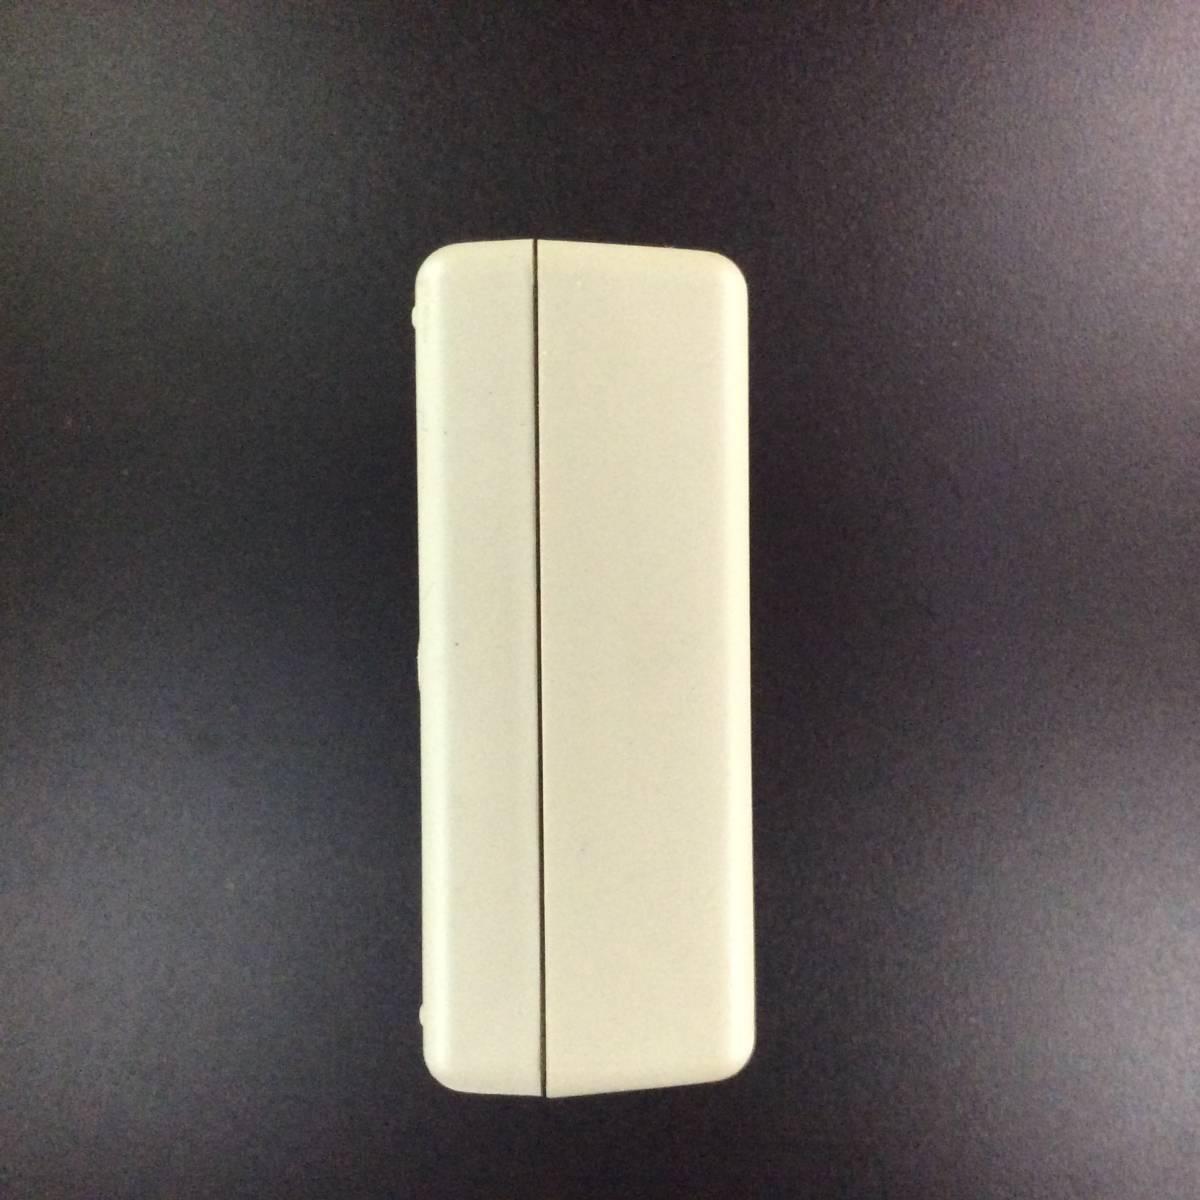 ★☆★ NTT 西日本 SL-144K F DSU-E〈R〉★☆★ 一度使用 美品 ★☆★ISDN DSU I-DSU64VB デジタル回線接続装置 _画像5